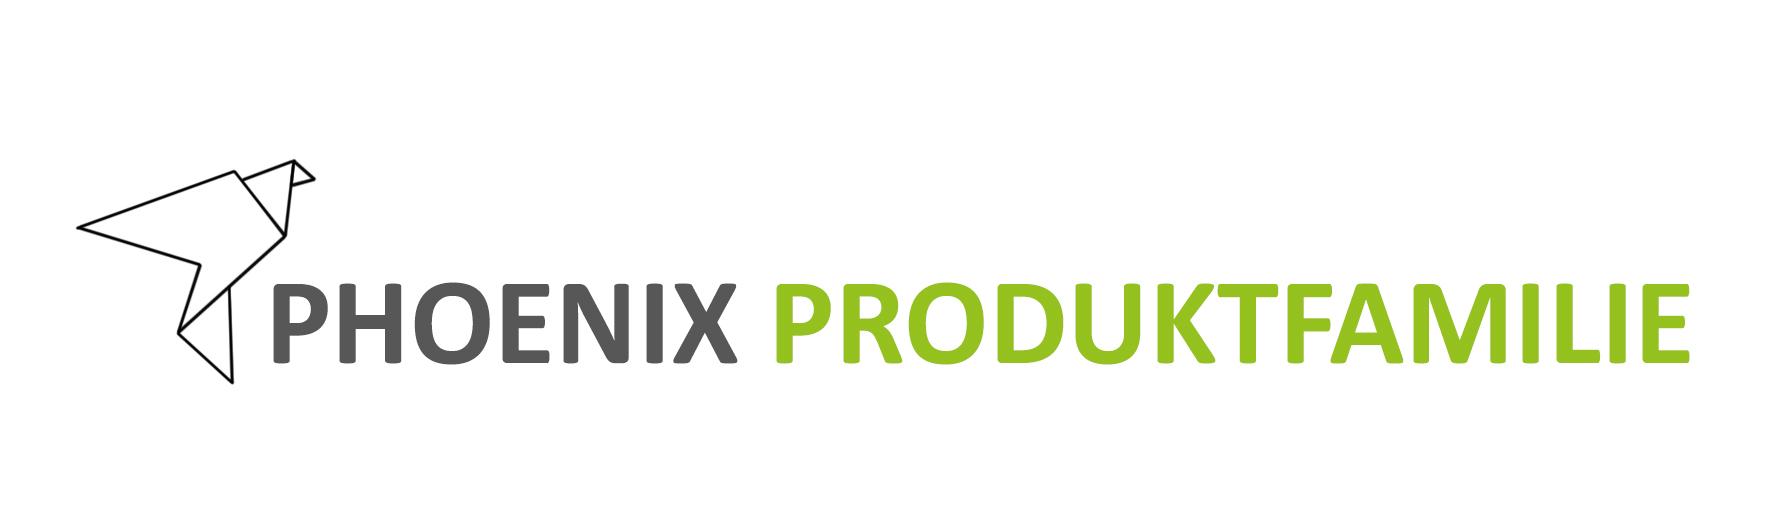 Logo Phoenix Produktfamilie neu grau grün